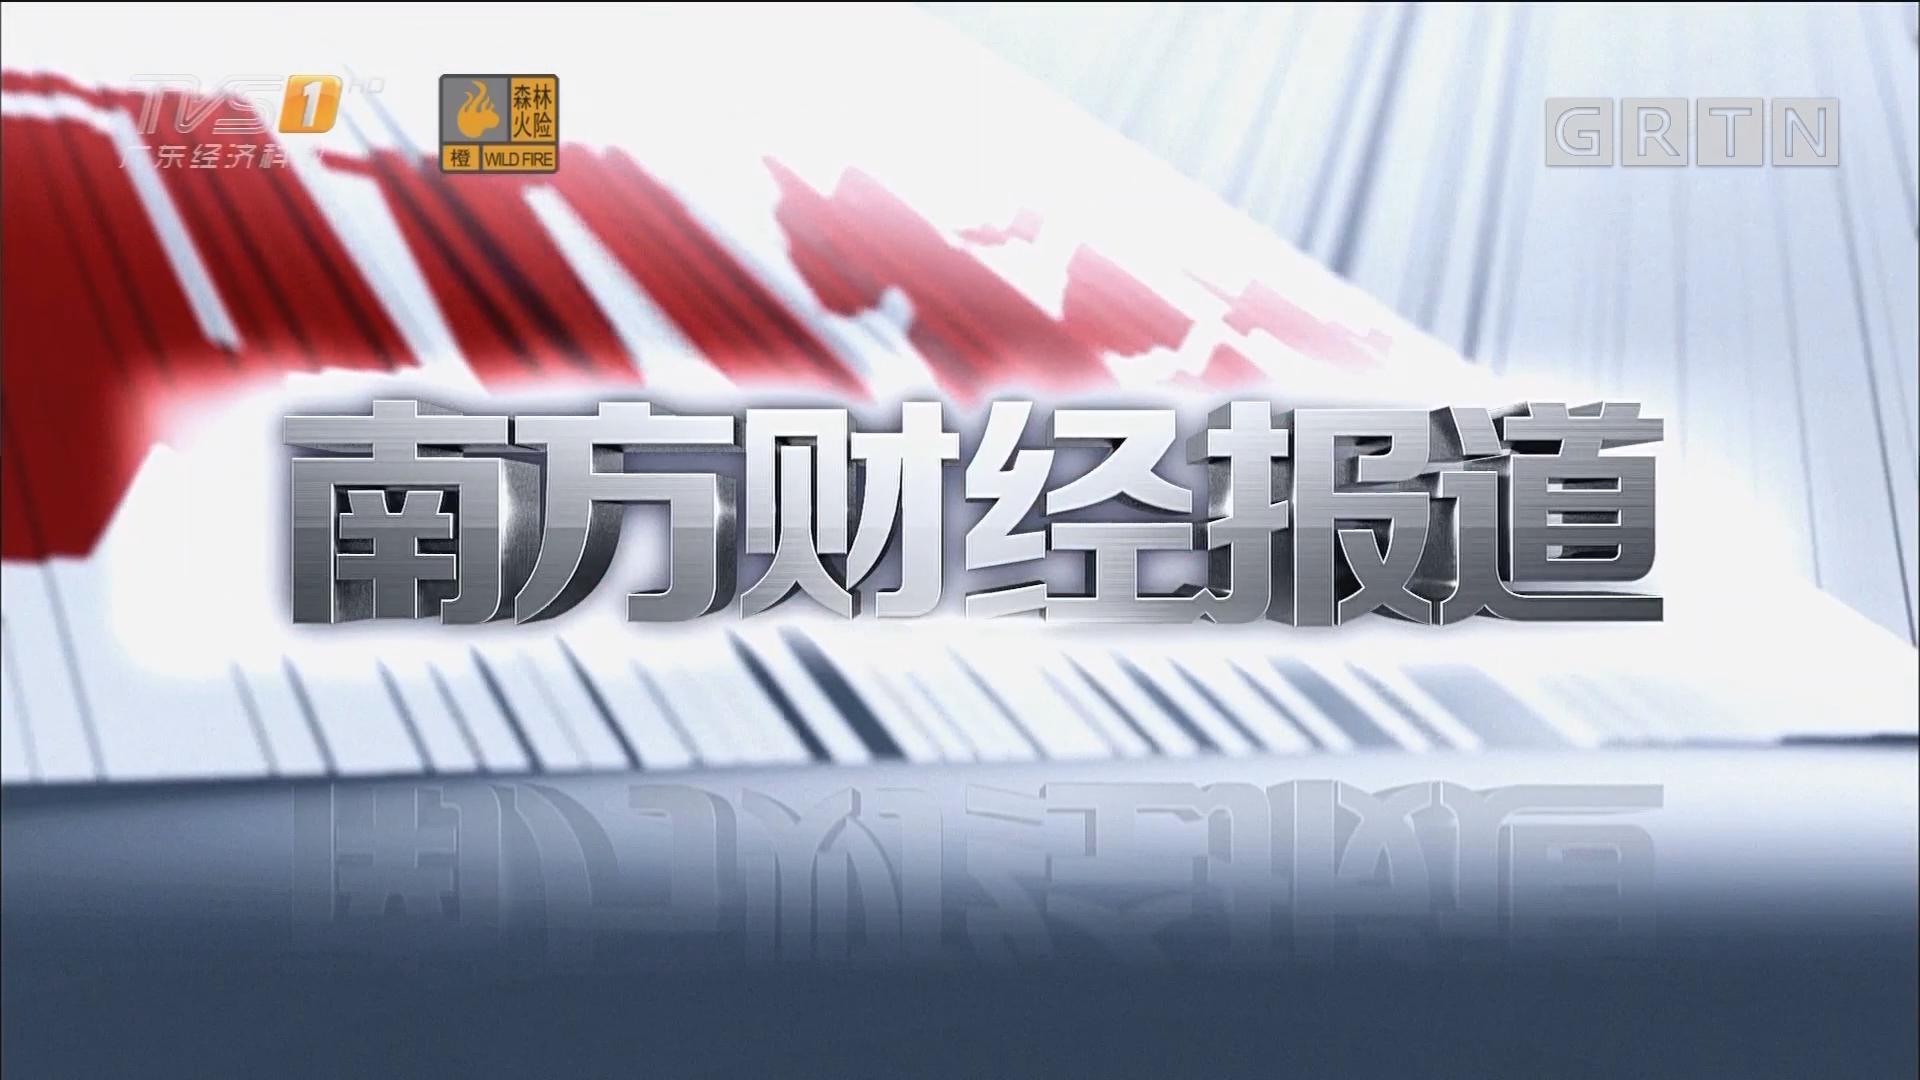 [HD][2017-10-26]南方财经报道:豪情满怀迈进新时代——各地各界欢庆党的十九大胜利闭幕